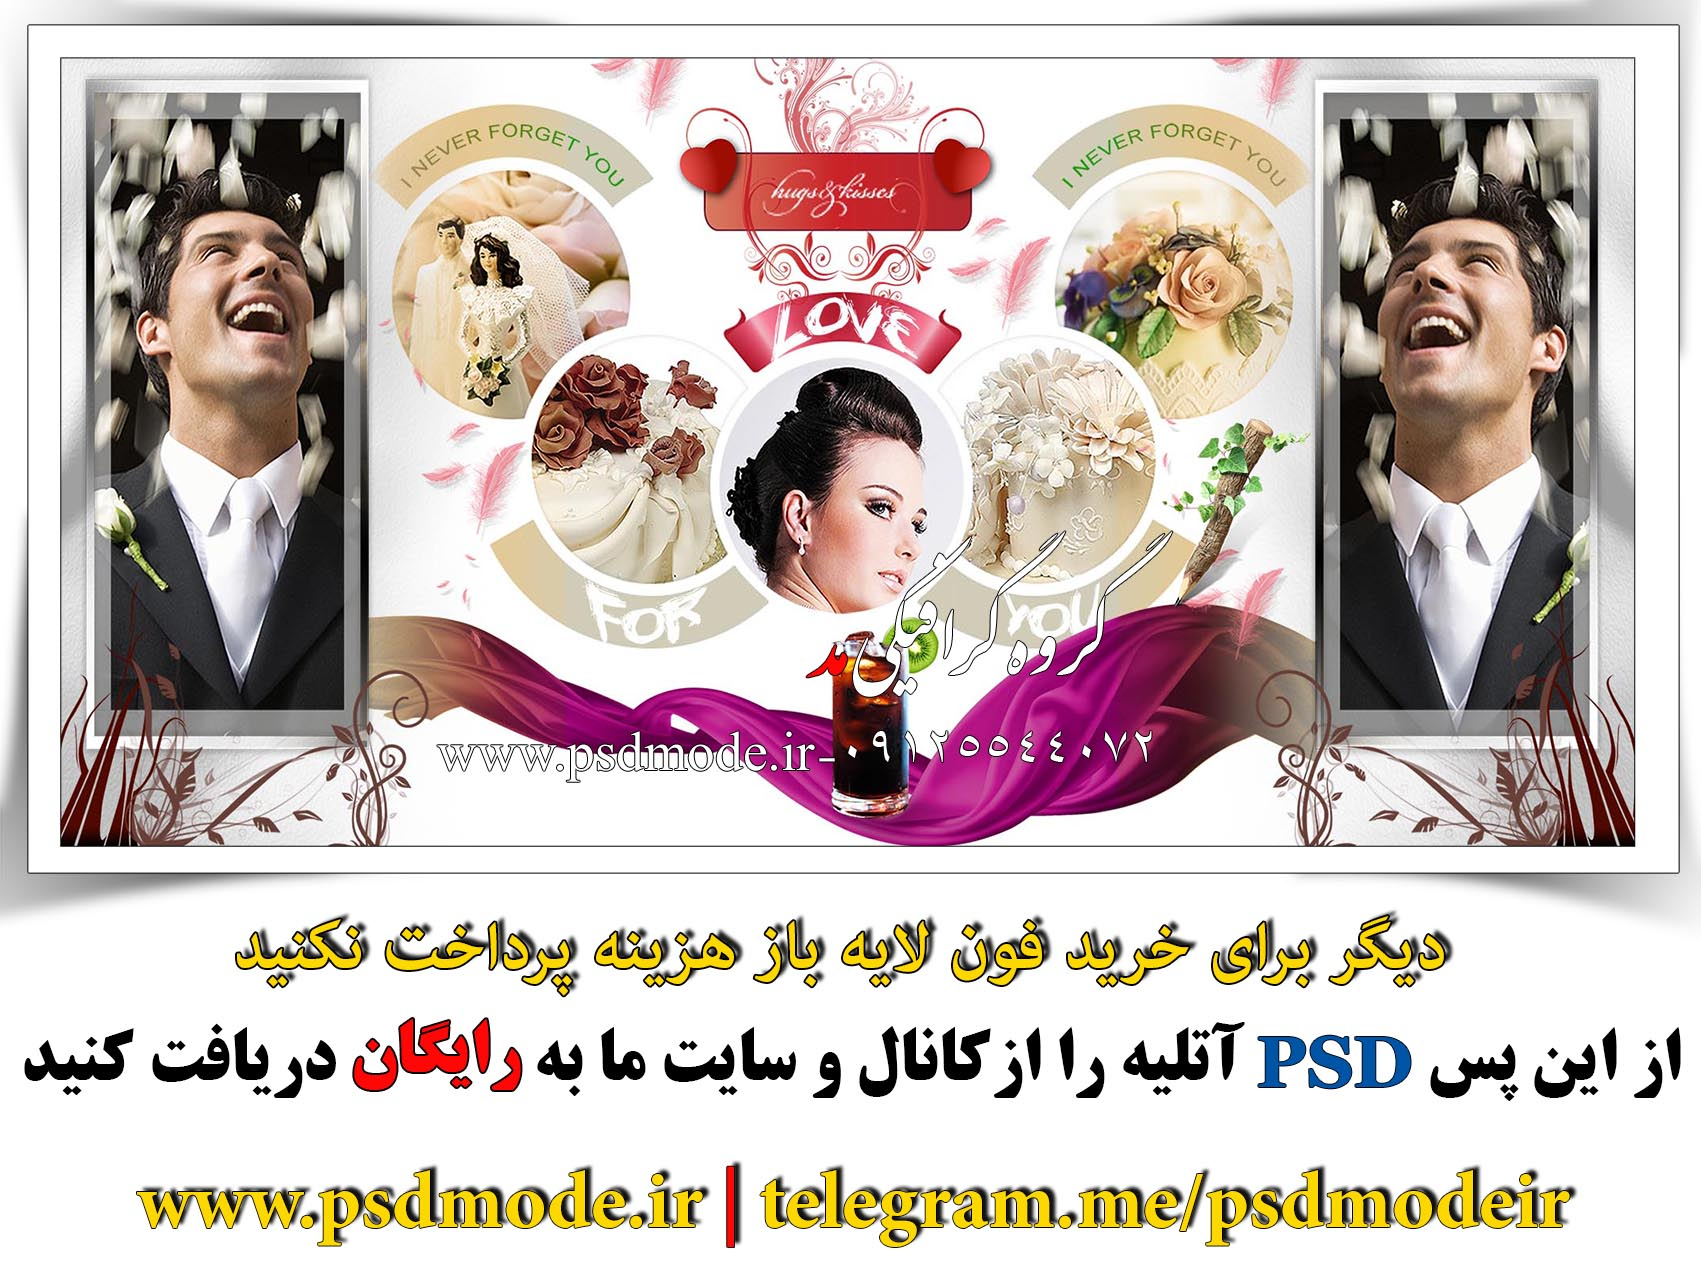 آلبوم دیجیتال عروس و داماد